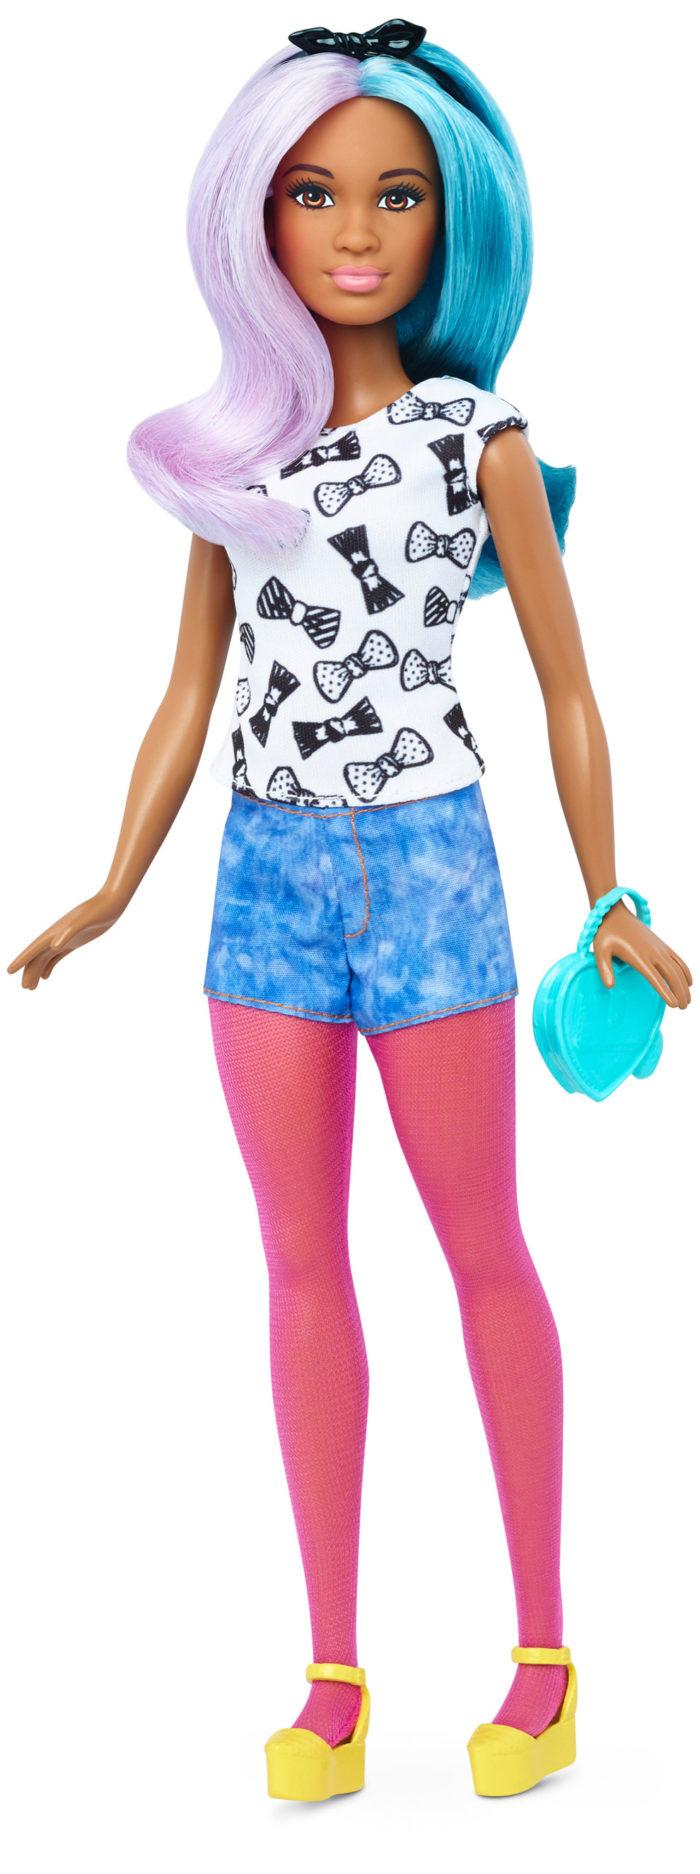 barbie-nuove-curvy-bassa-alta-realistica-03